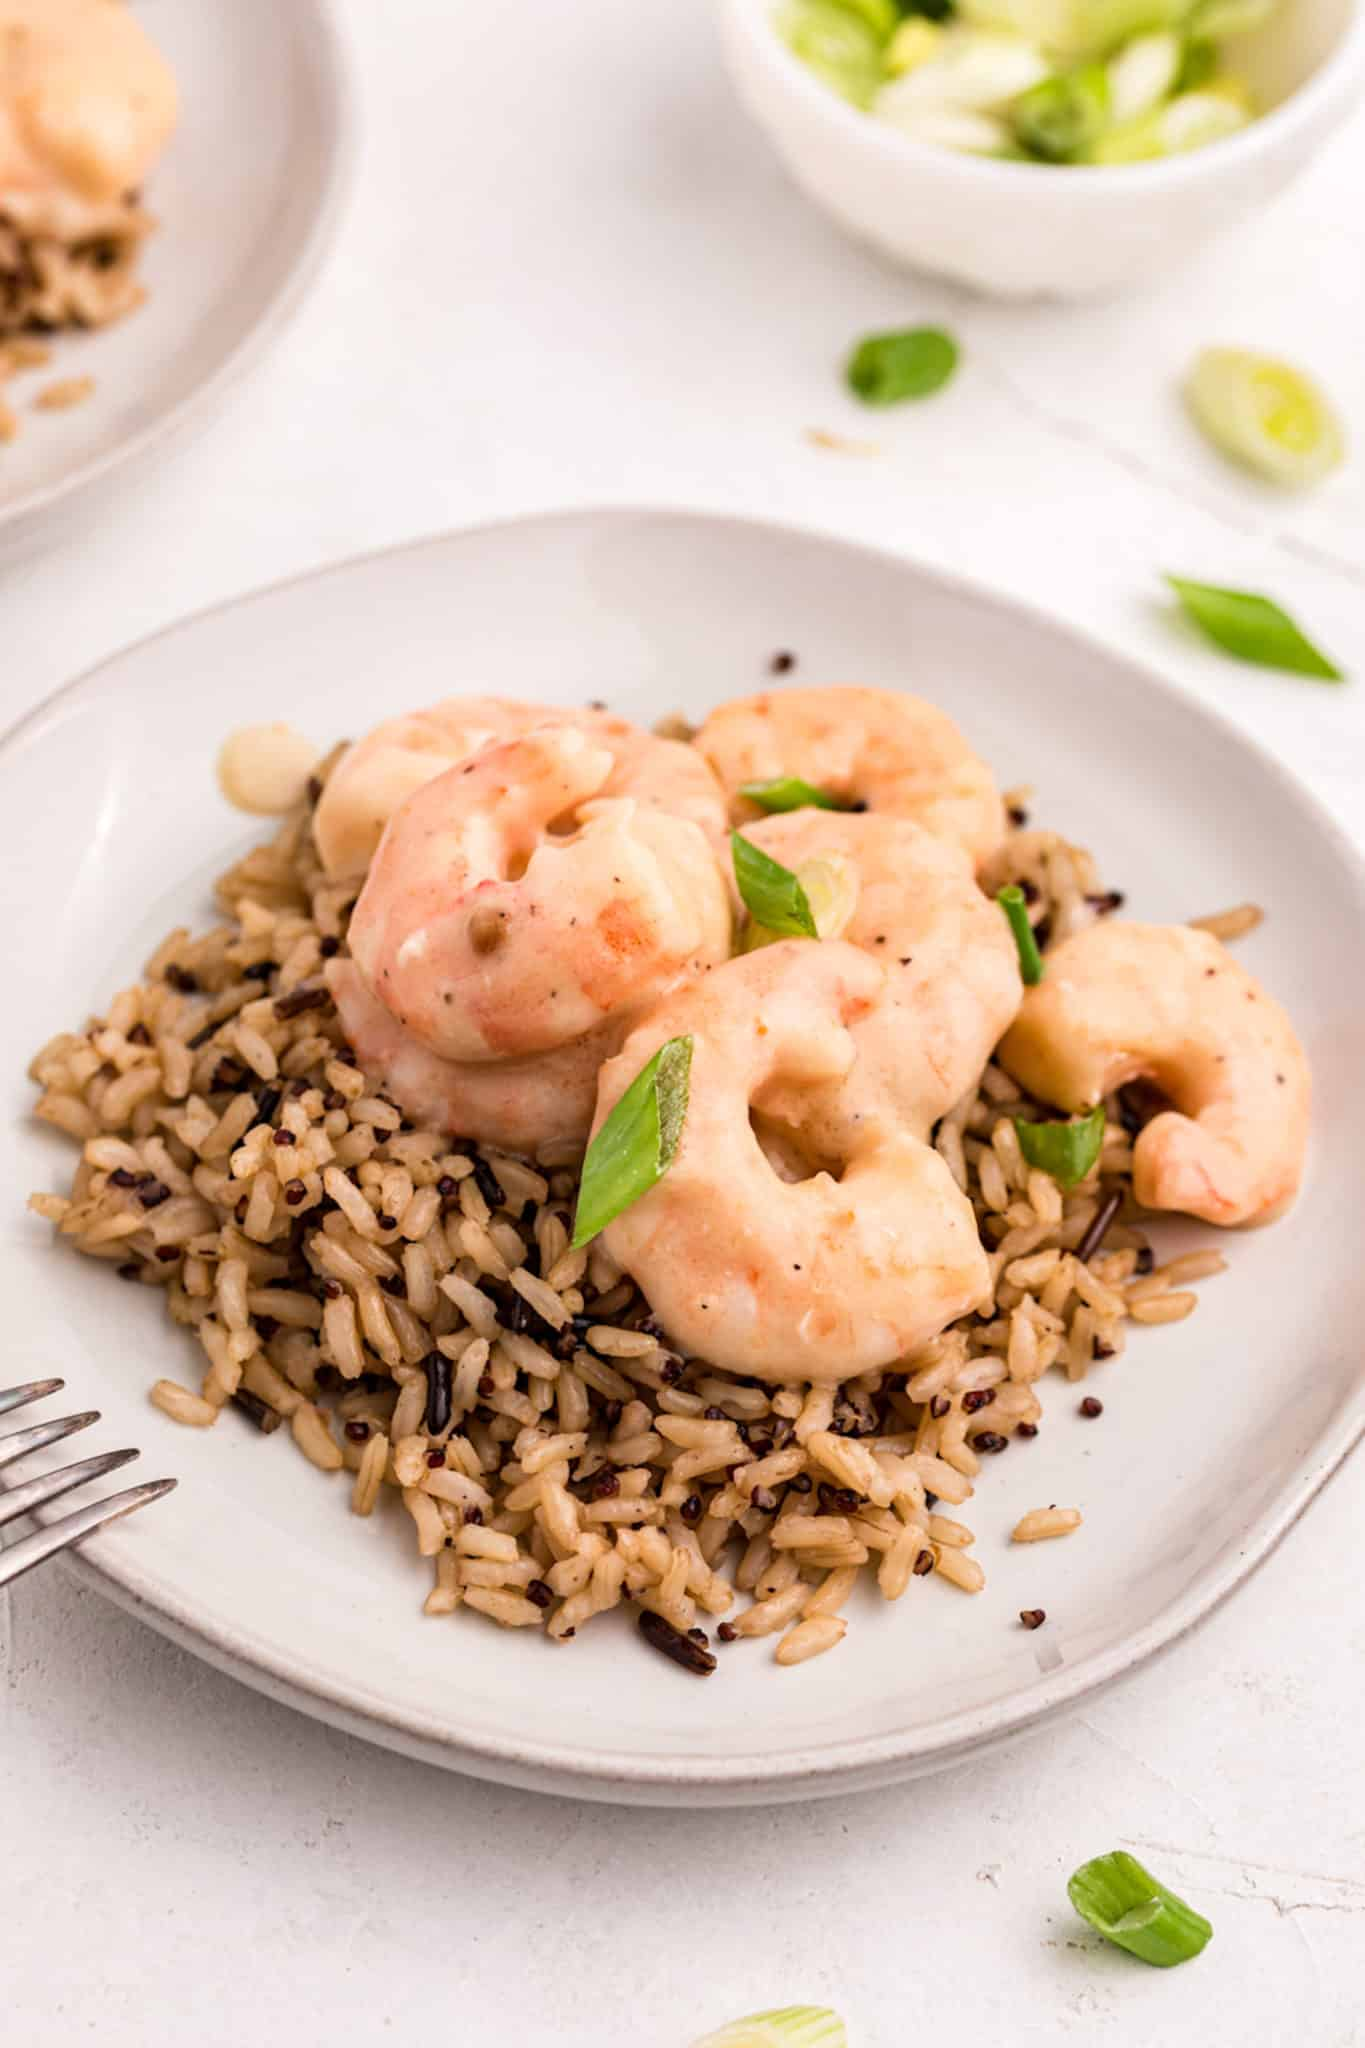 coconut shrimp served over rice